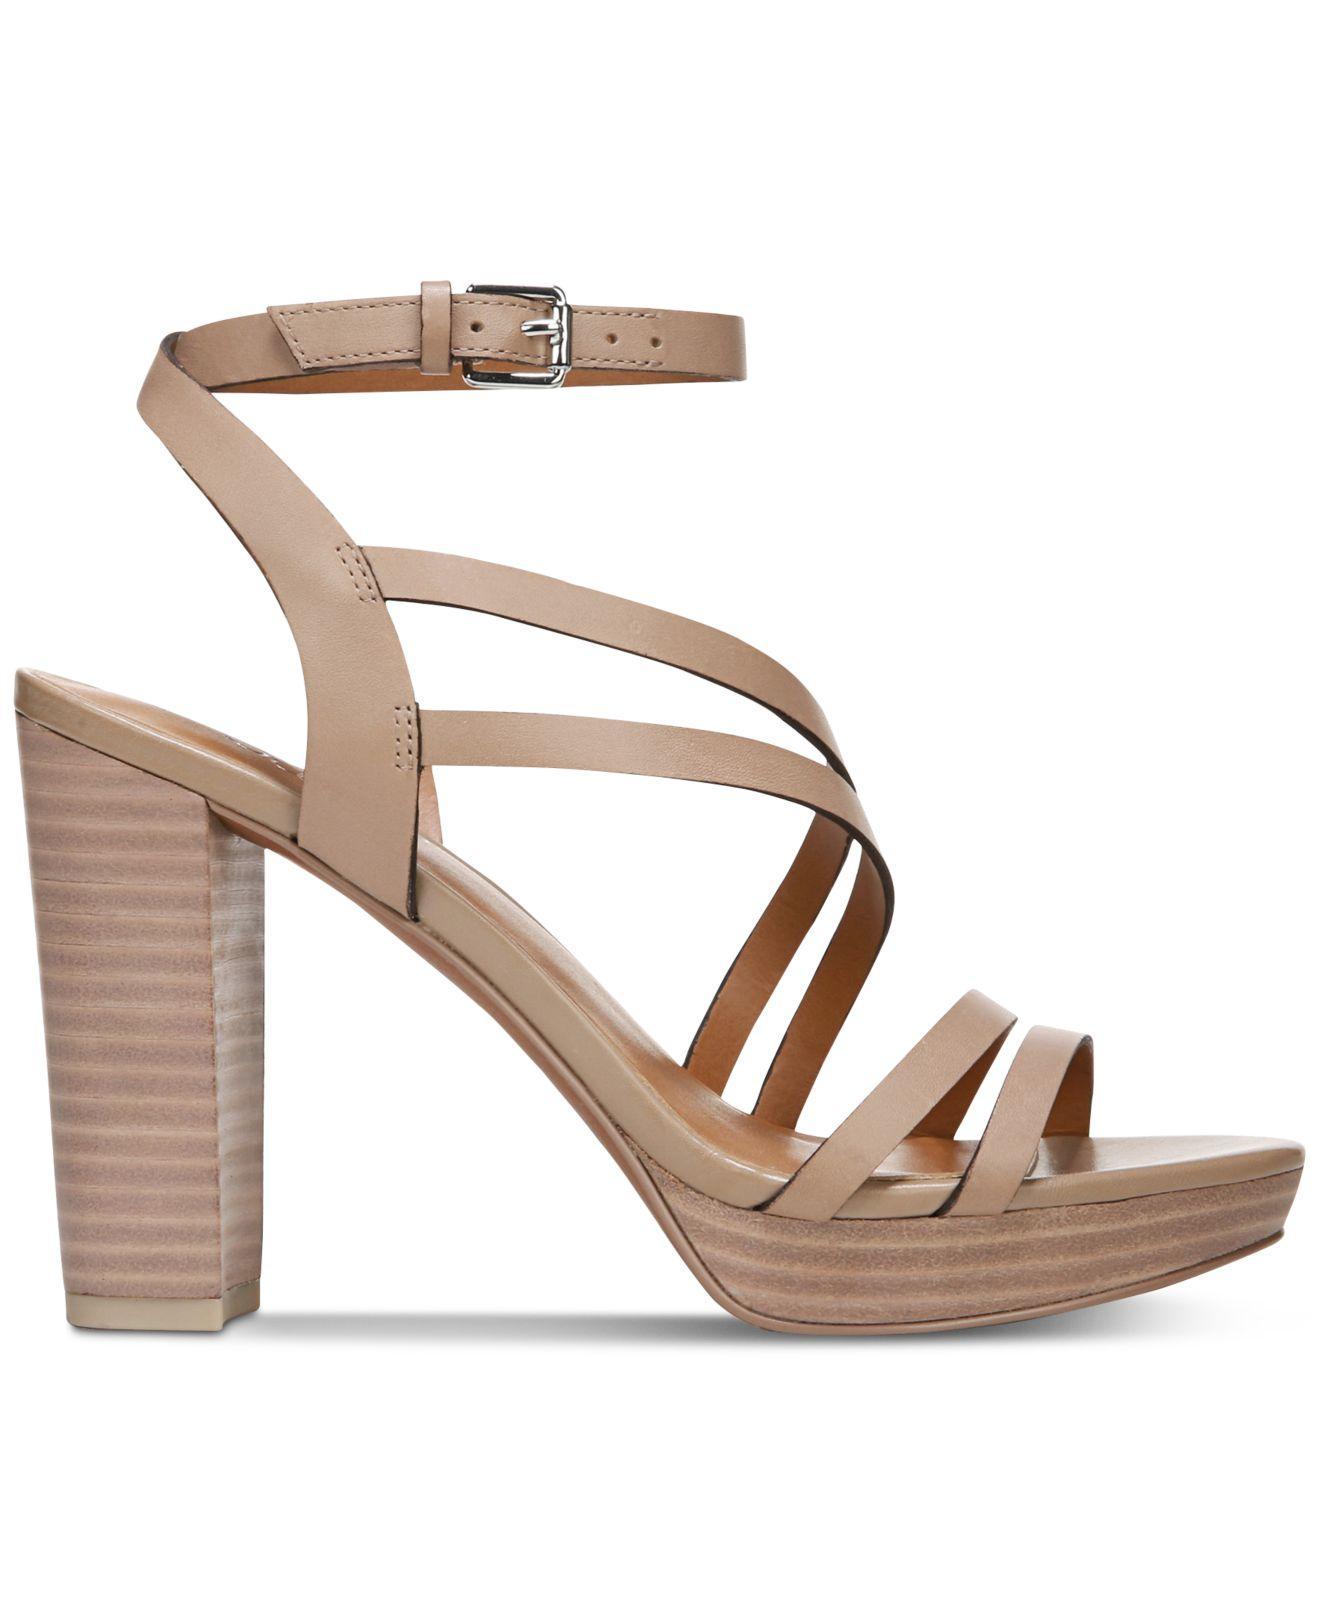 9c5120aedab Franco Sarto - Brown Maryann Platform Dress Sandals - Lyst. View fullscreen